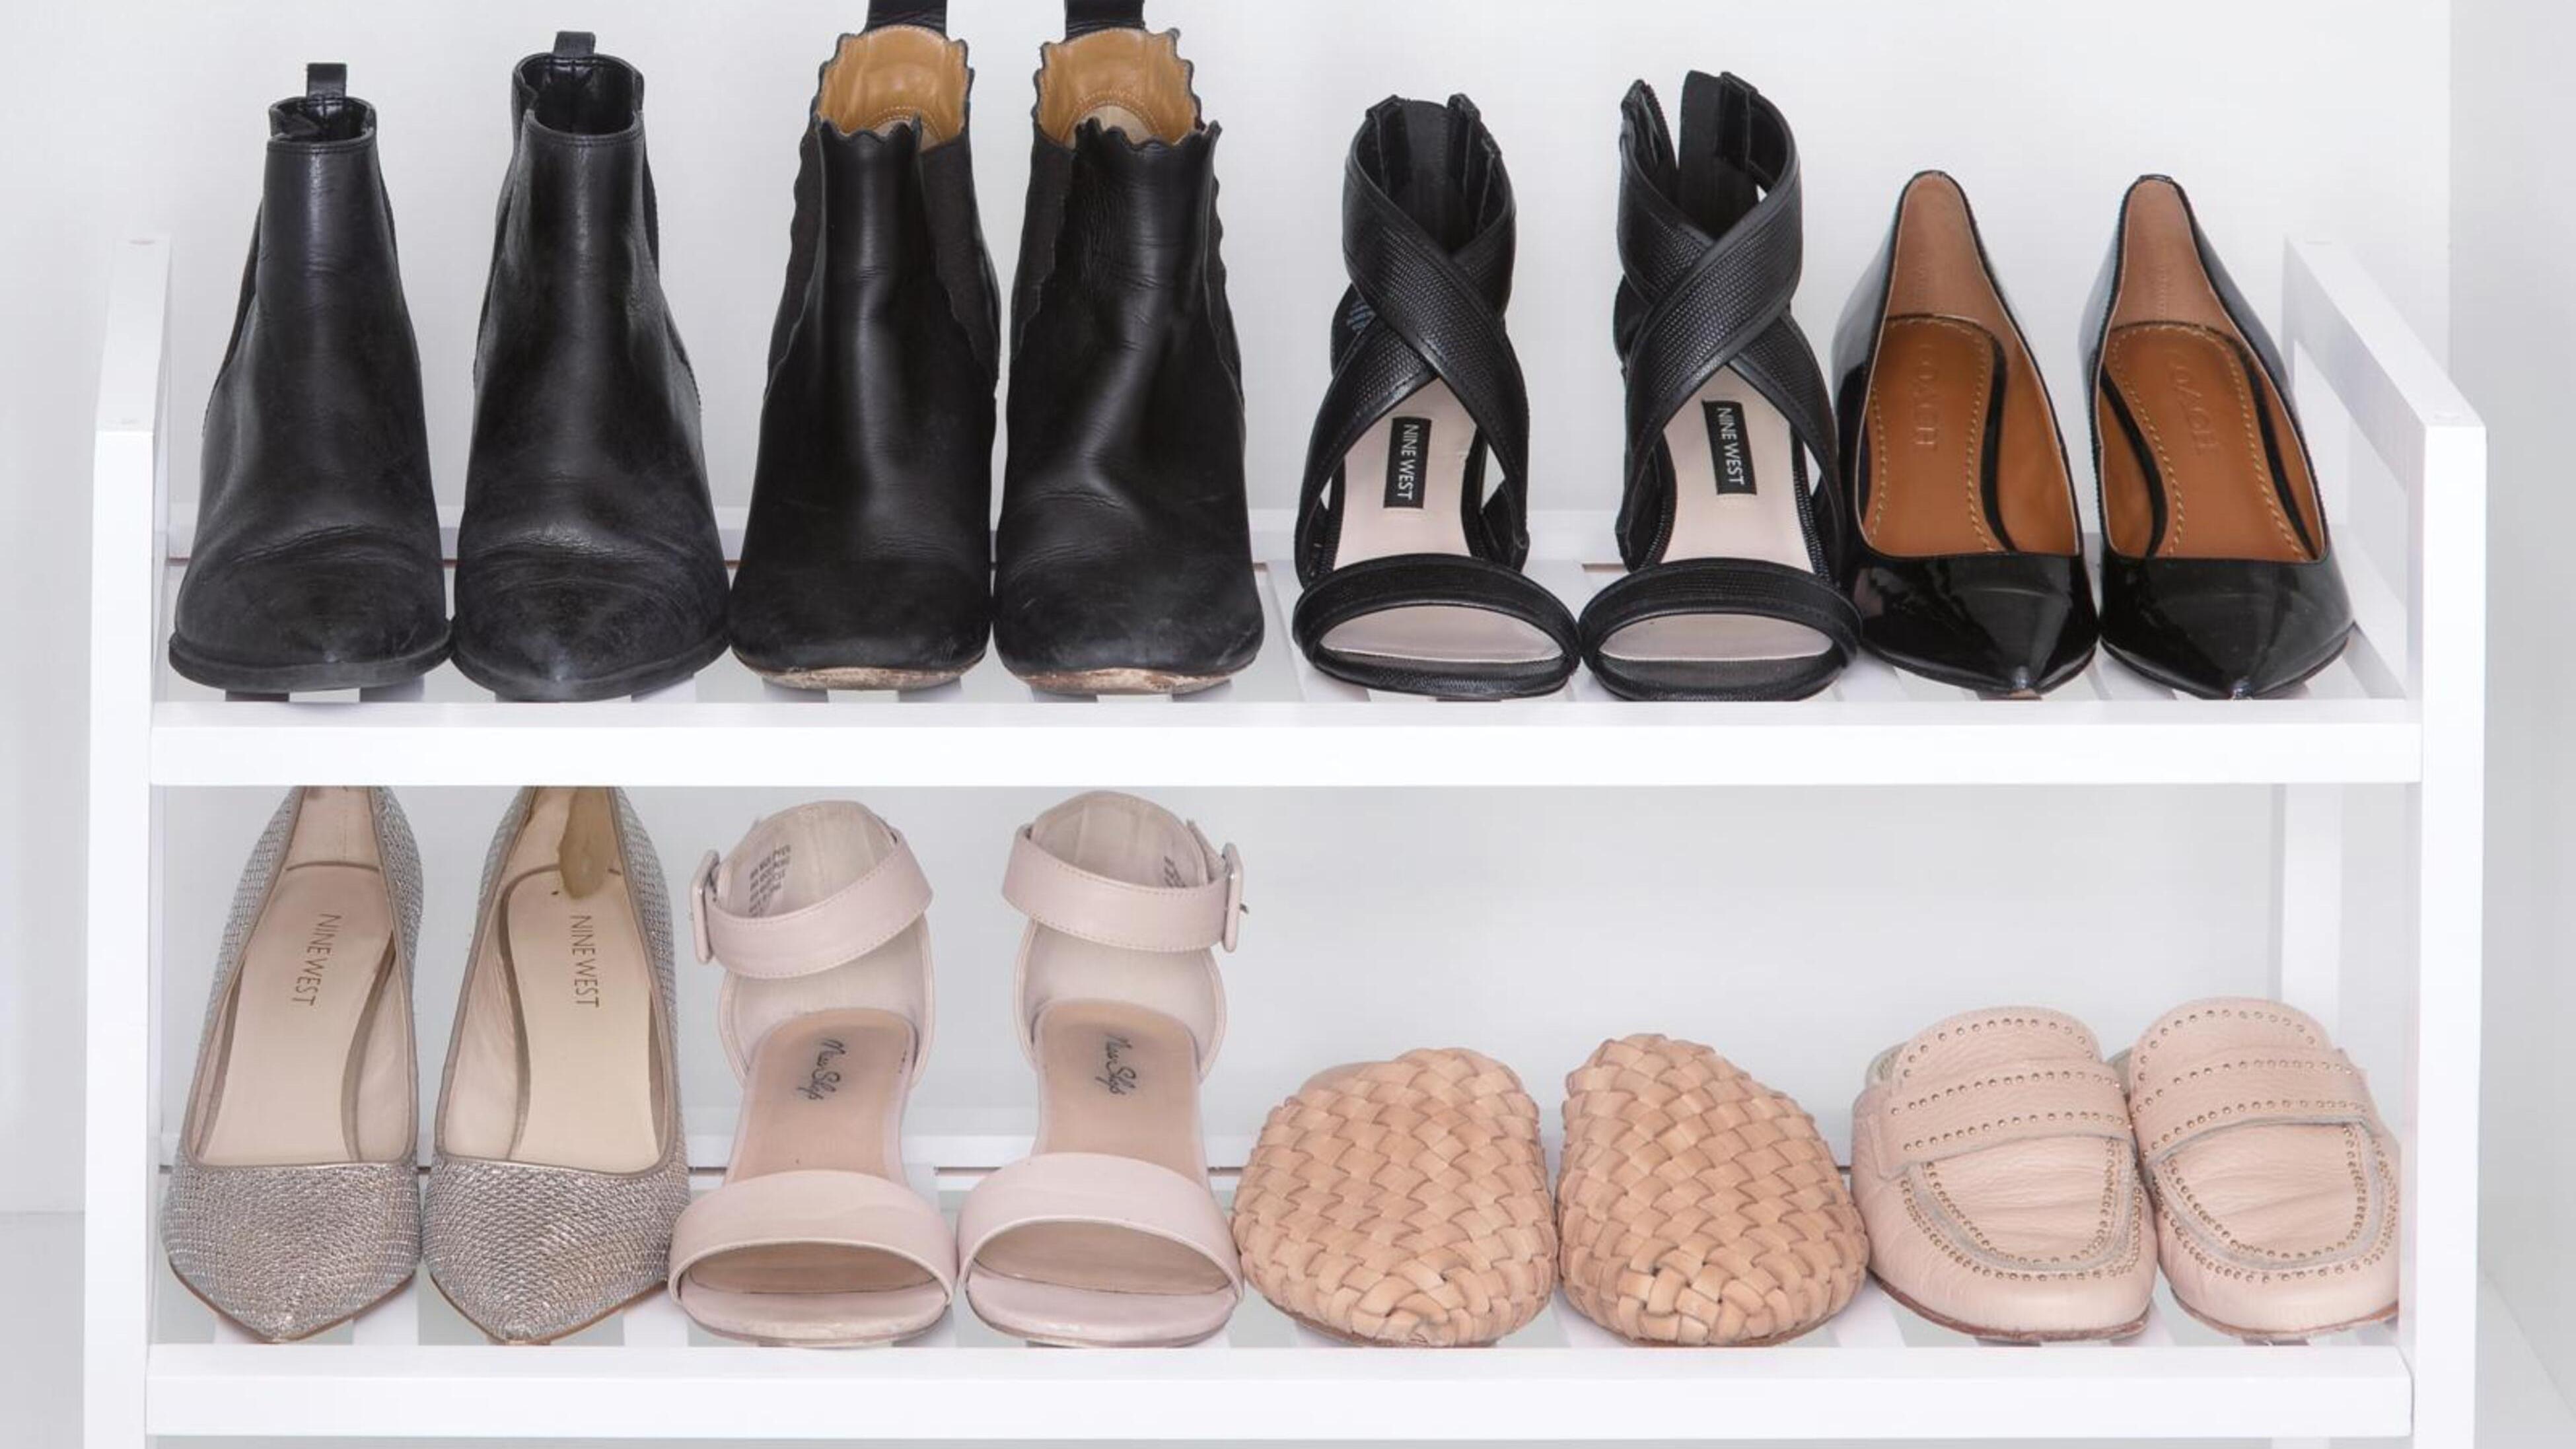 Shoes on shoe rack.